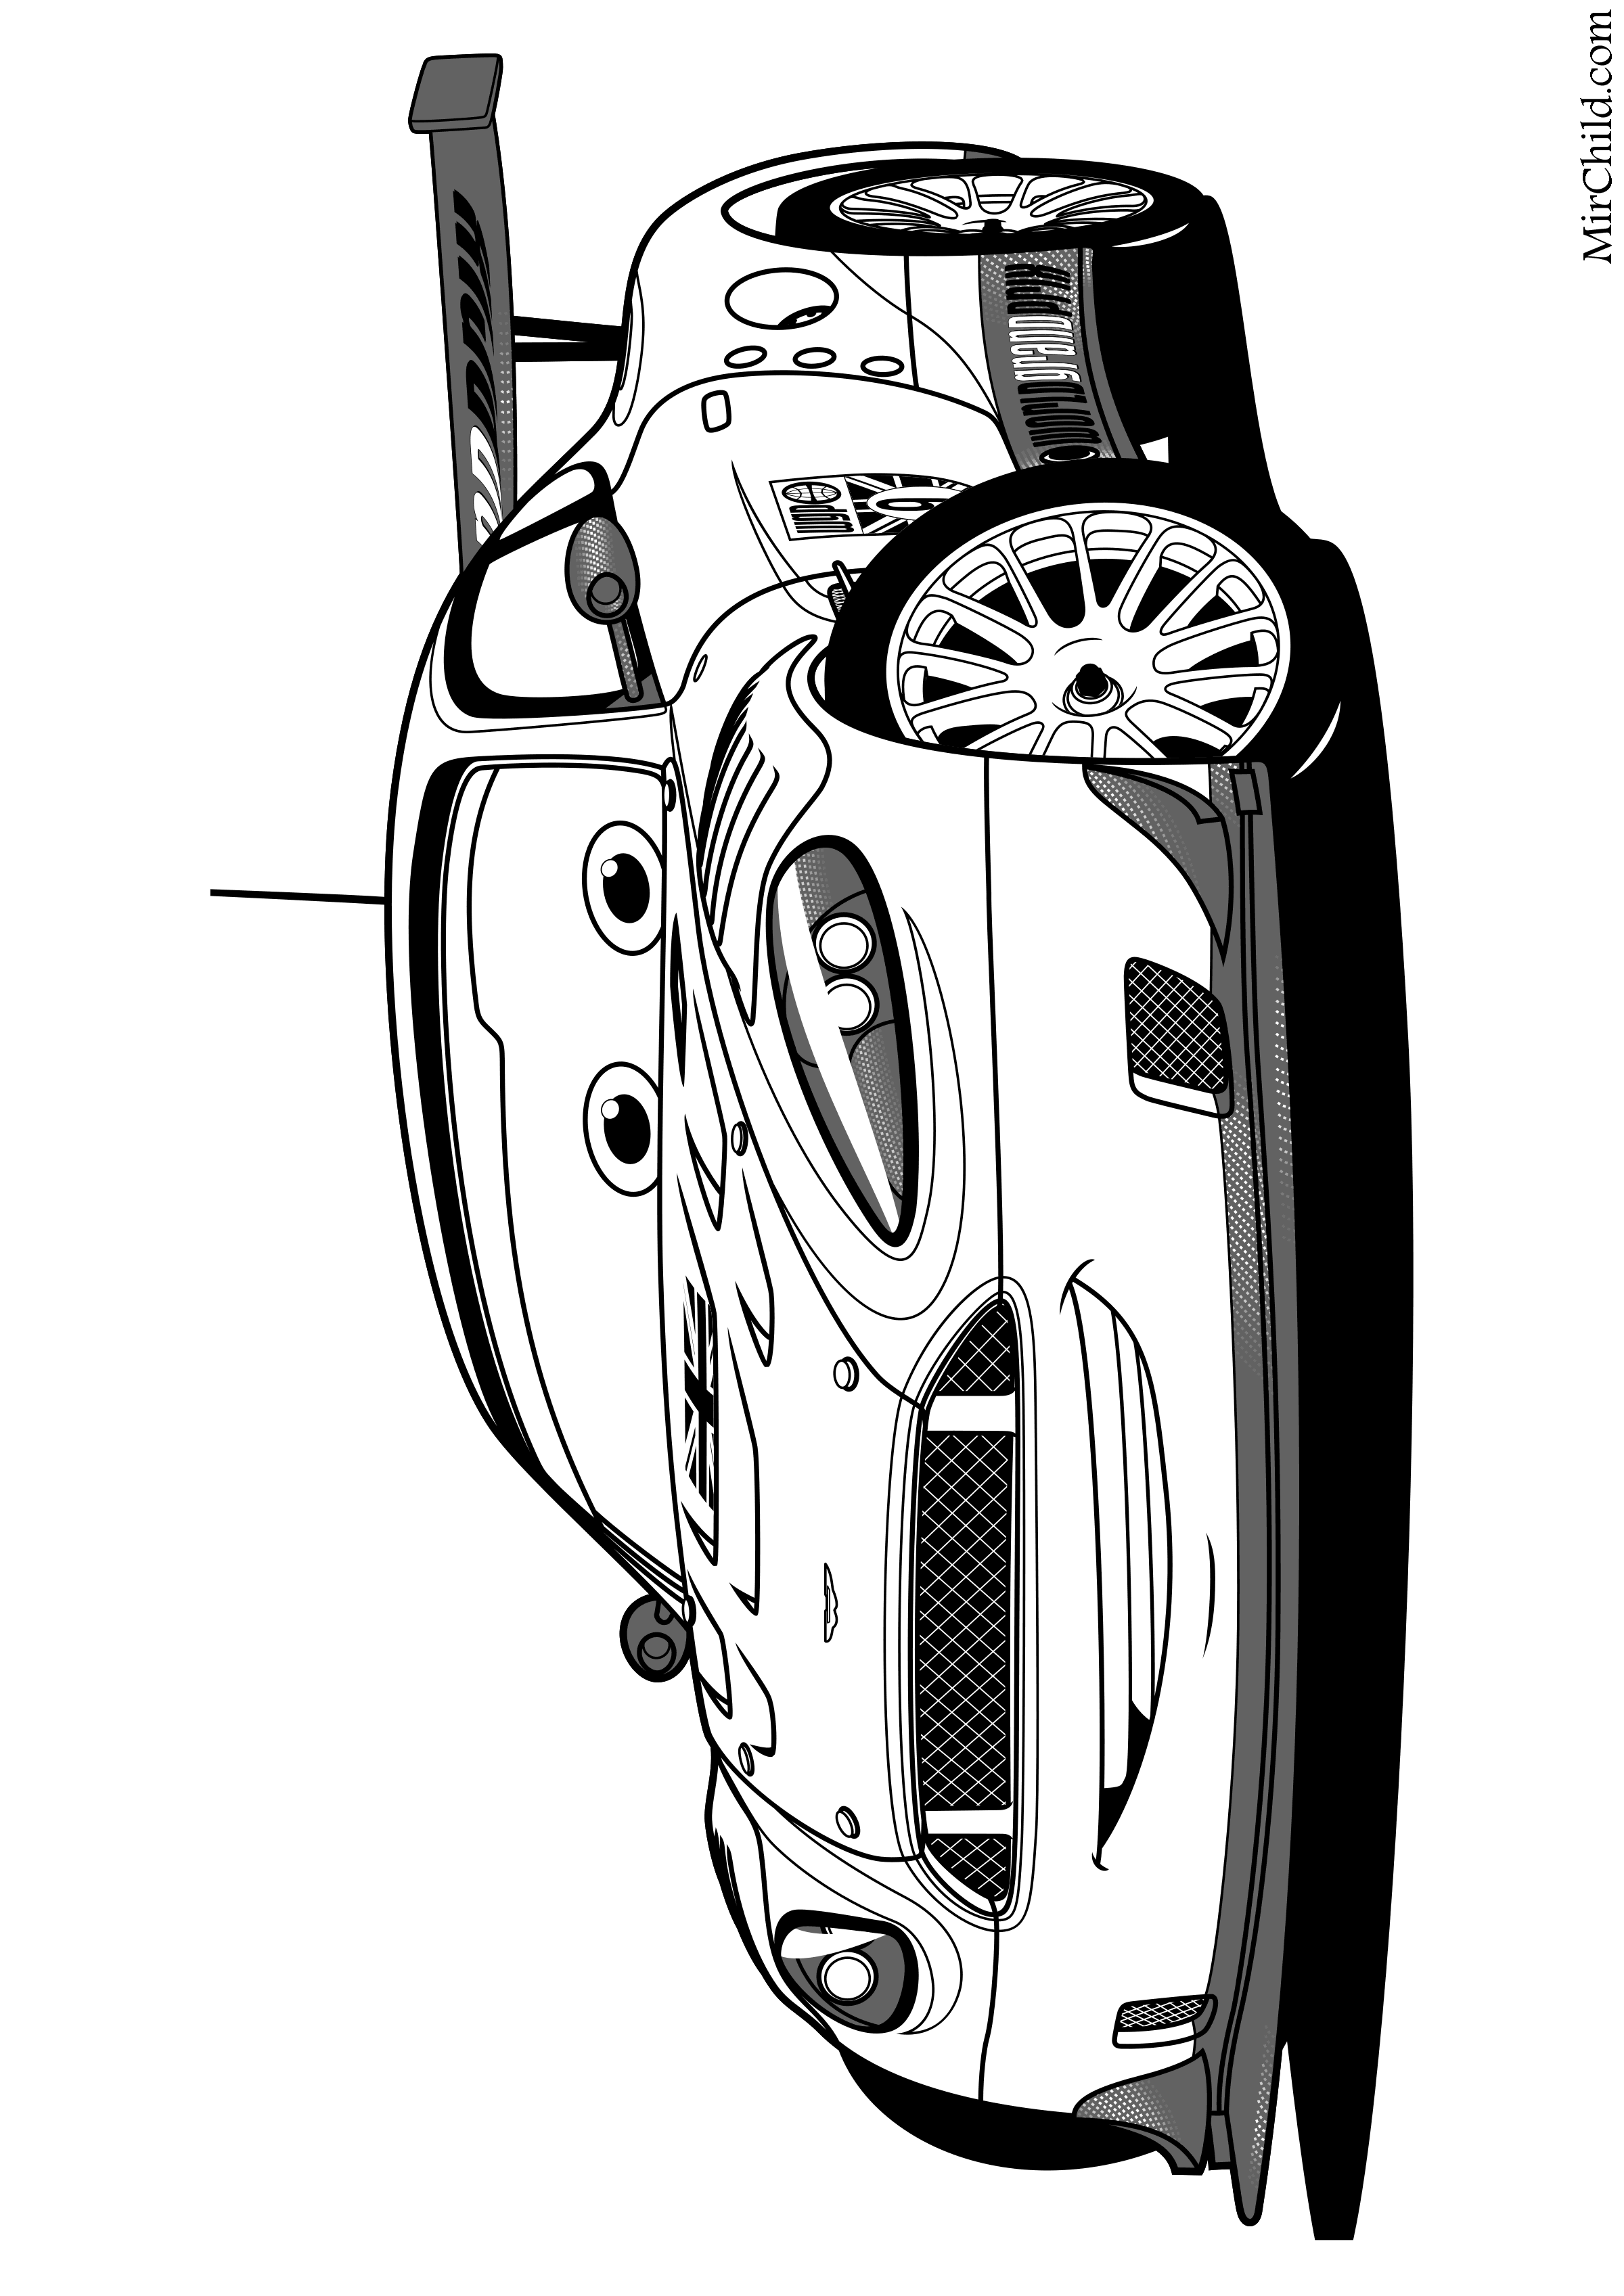 Раскраска - Тачки 2 - Найджел Газли | MirChild